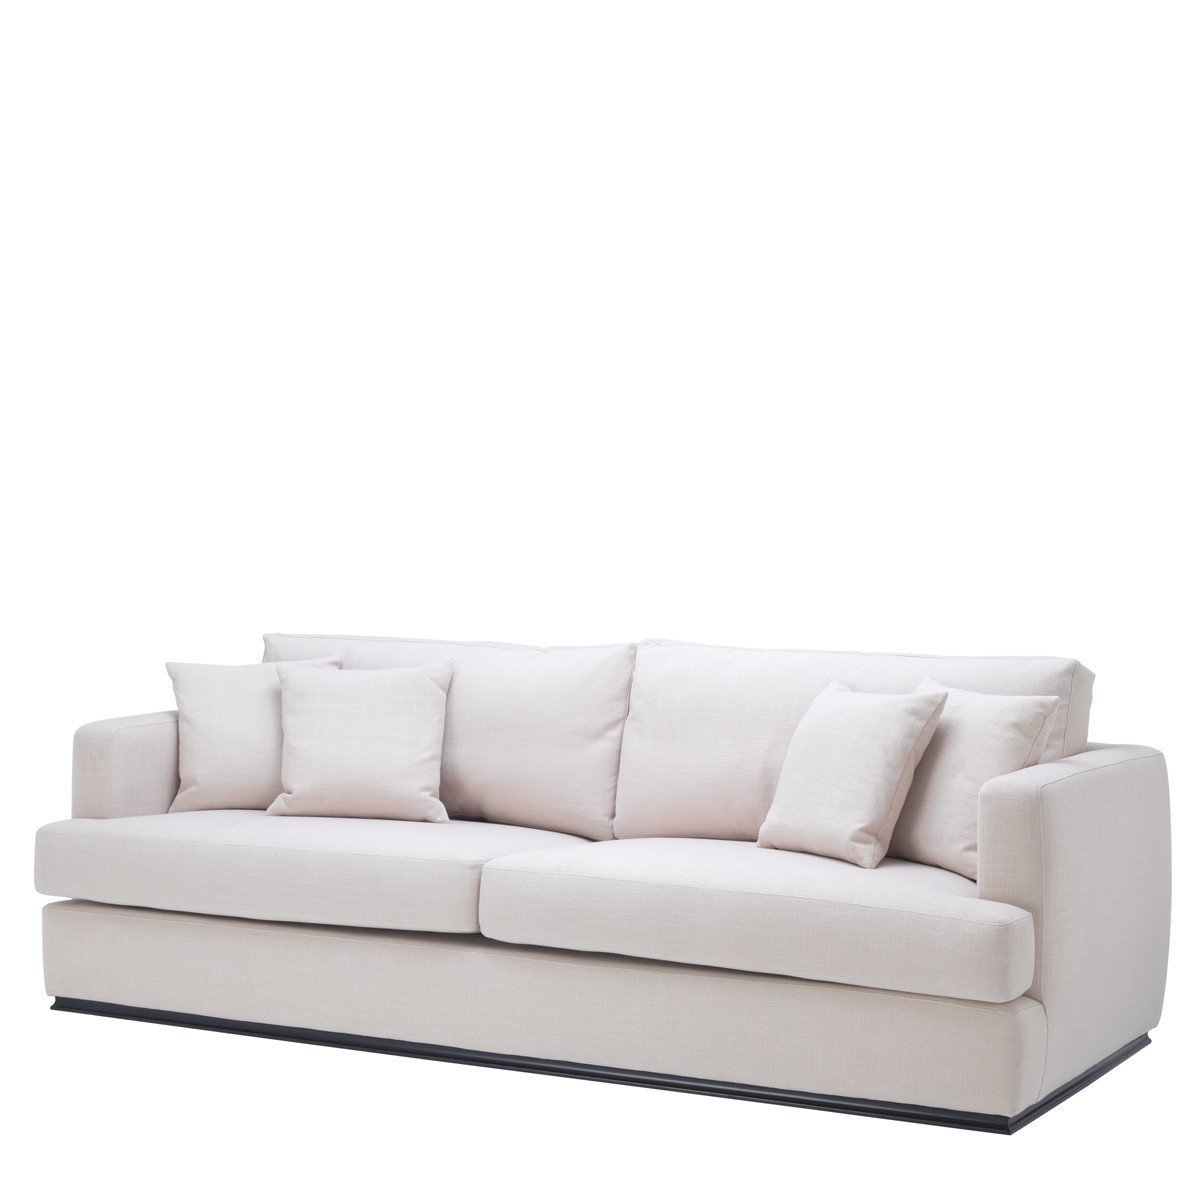 Amazon com eichholtz off white sofa hallandale kitchen dining